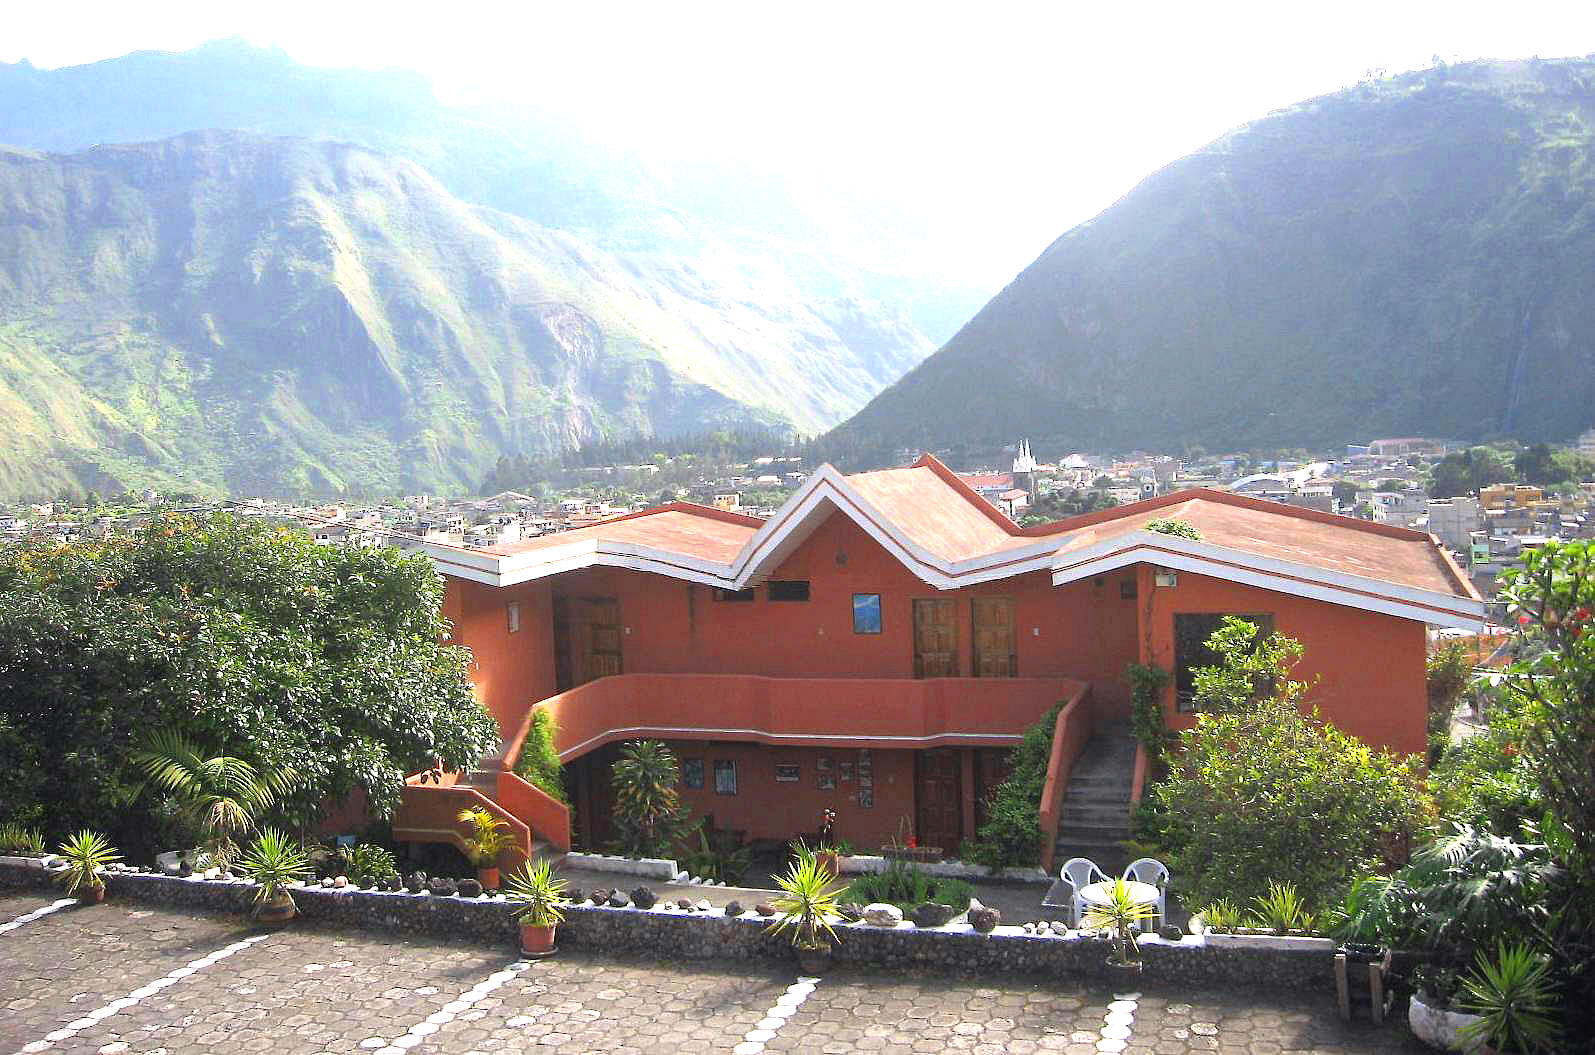 Hosteria llanovientos banos ecuador directorio local - Hoteles en banos ecuador ...